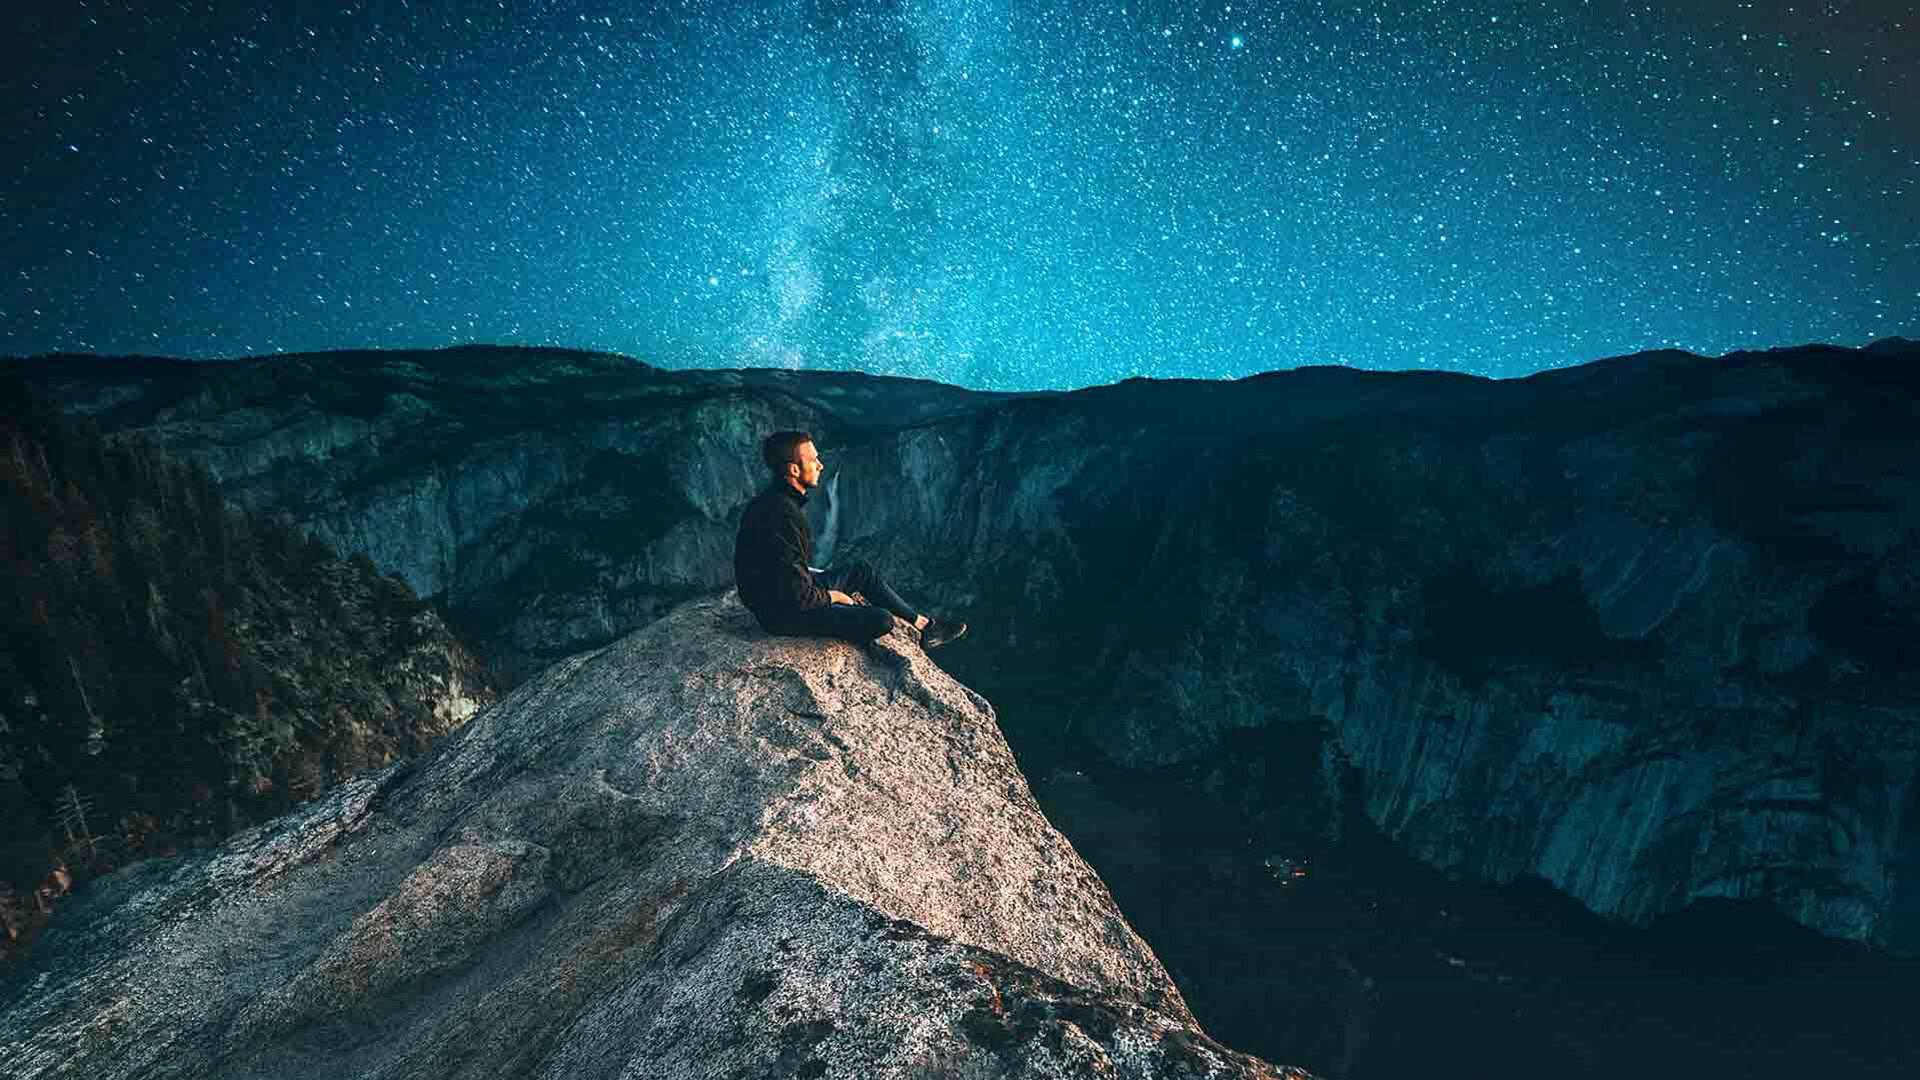 Star Walking: Stargazing and Hiking